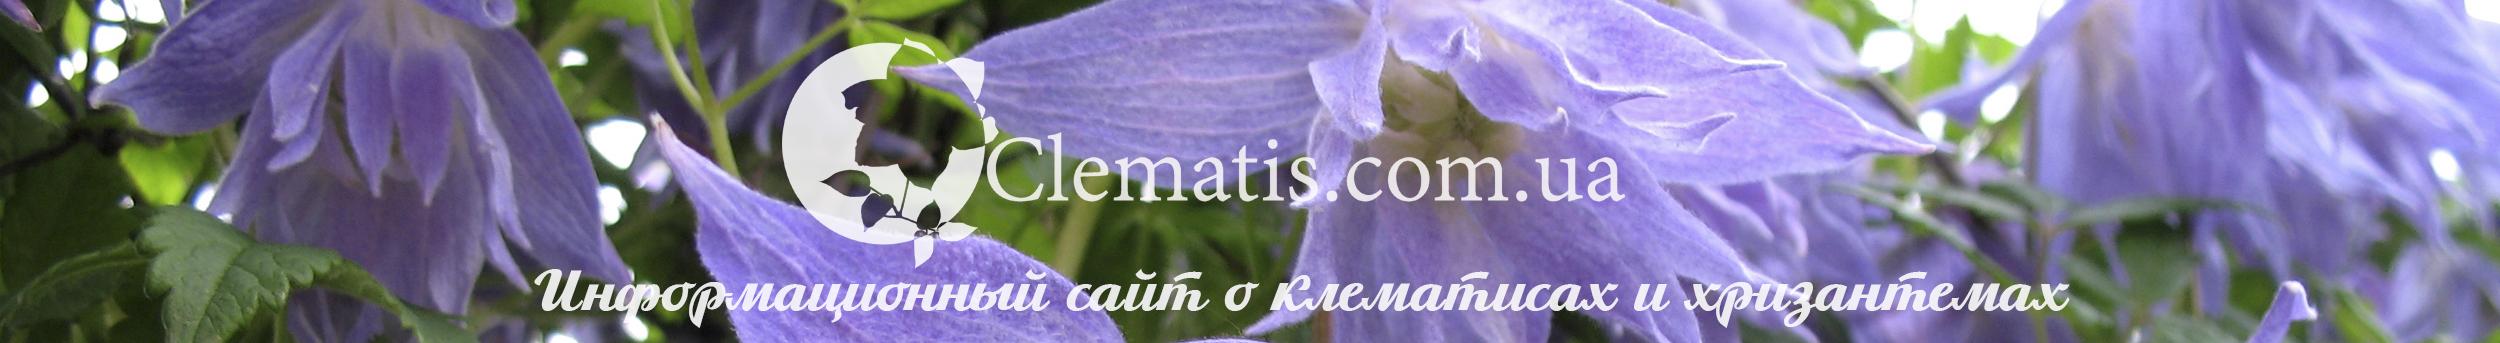 Clematis-Lozinka